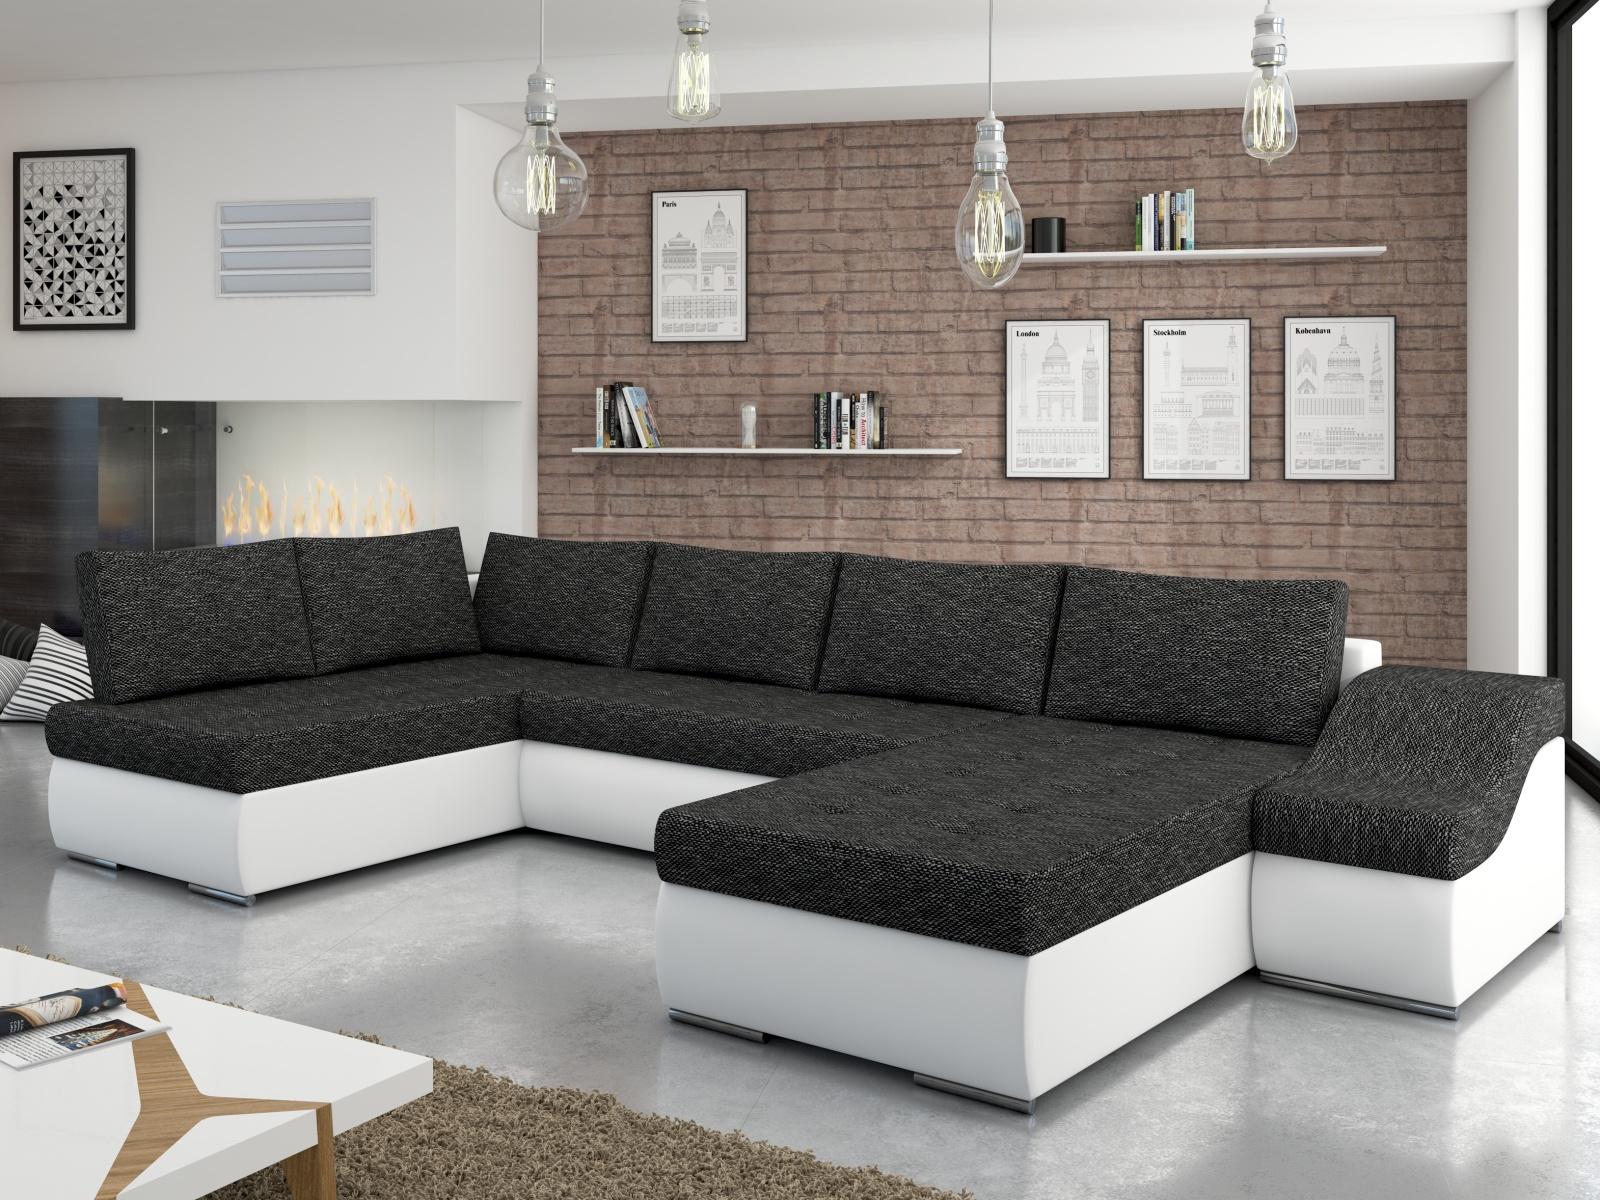 ELTAP Rohová sedačka GIOVANNI 05, černá látka/bílá ekokůže